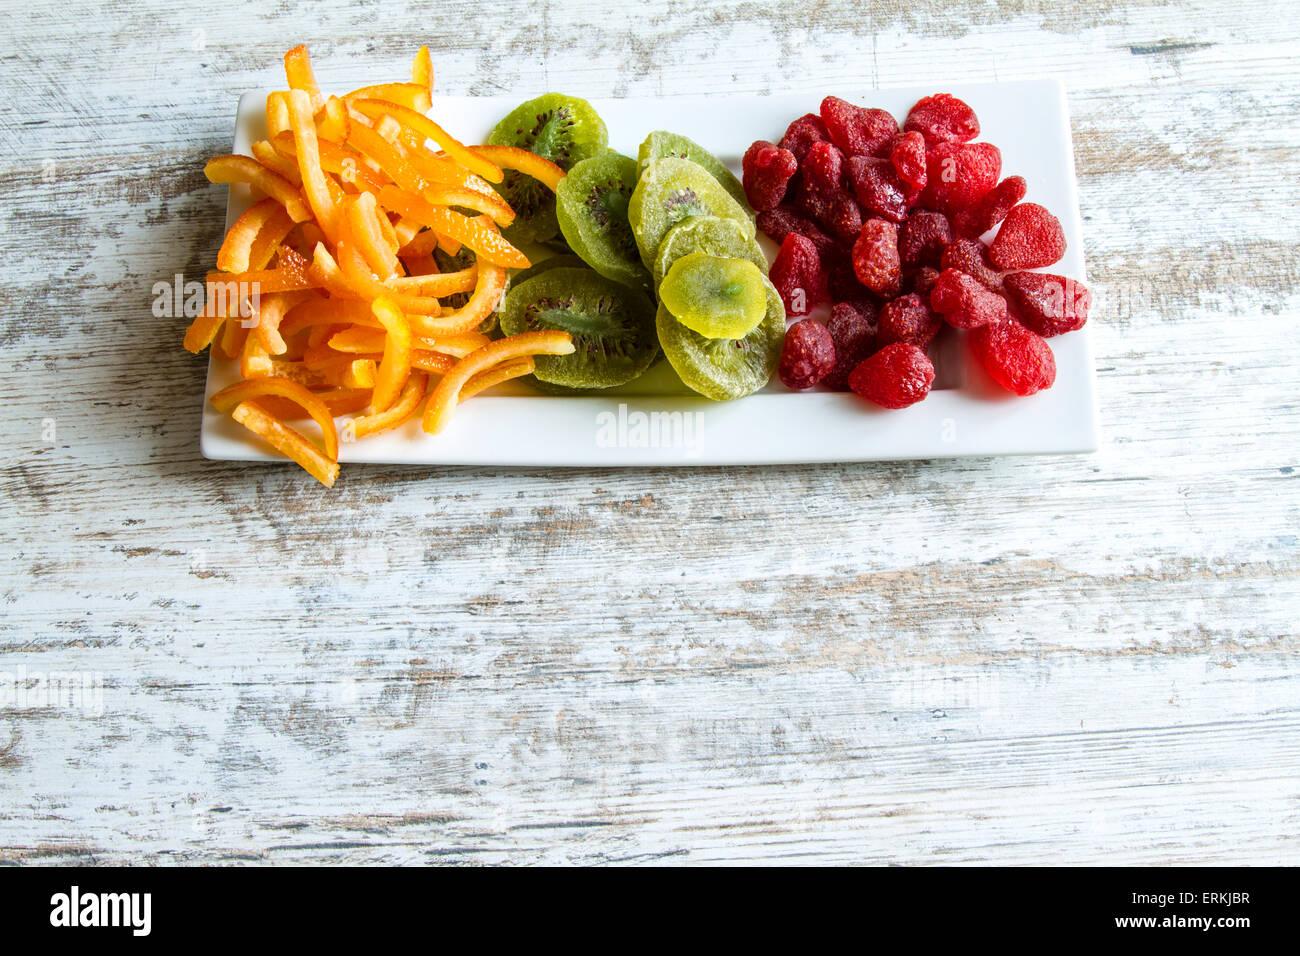 Orange, Kiwi and Strawberry on a plate - Stock Image